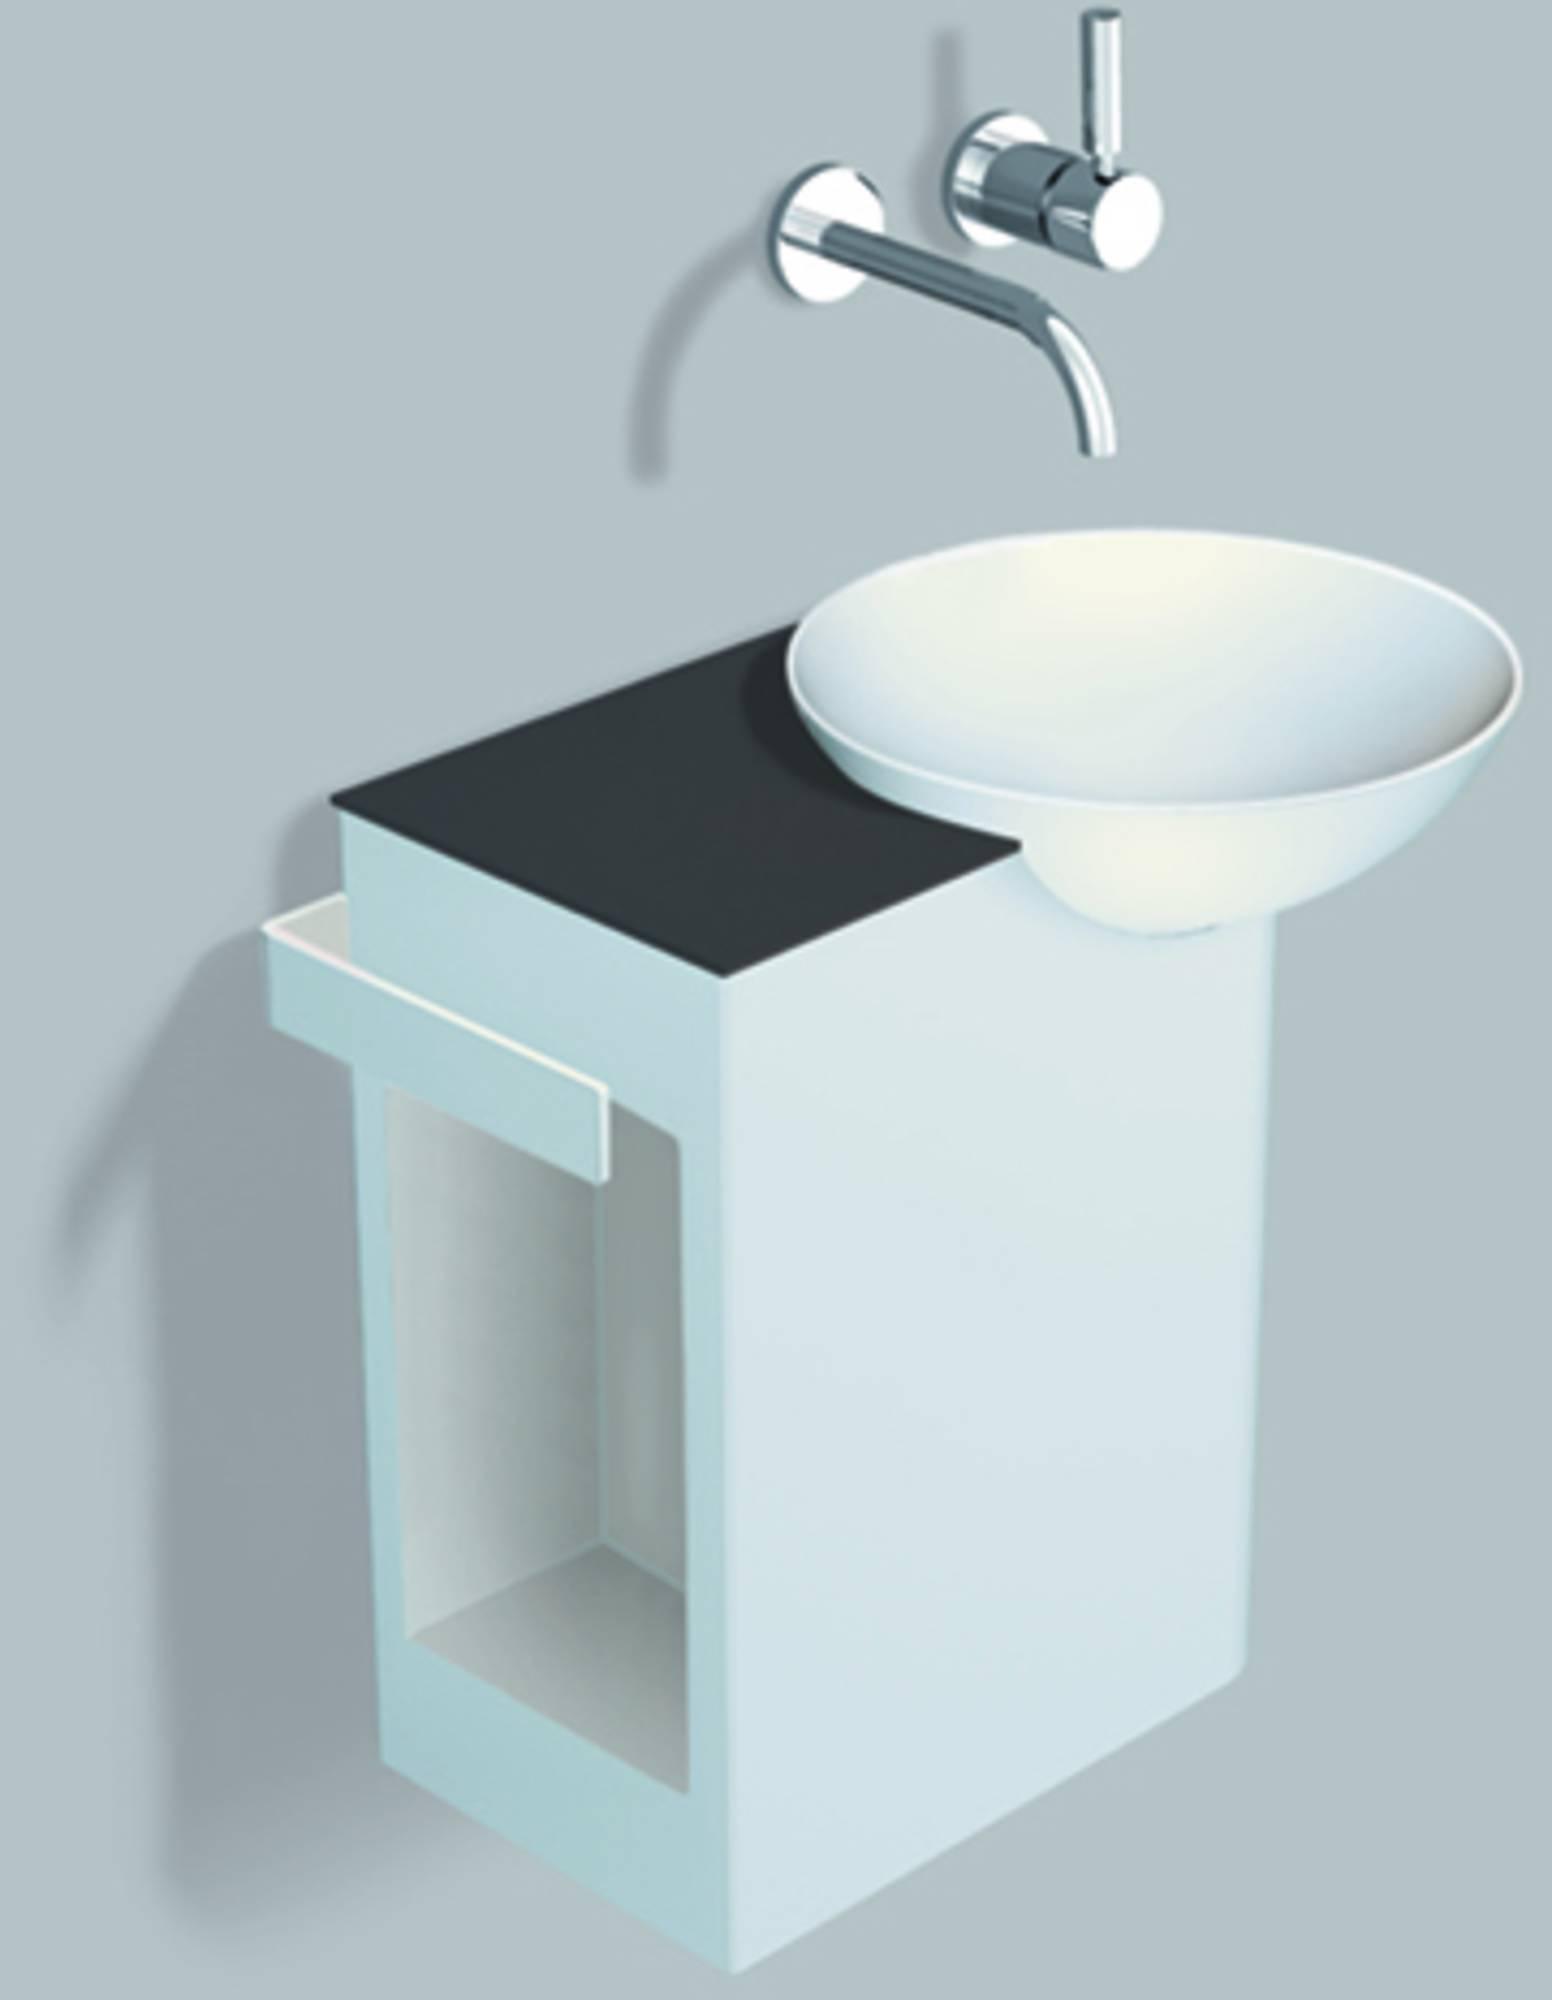 Alape Wp.insert 4 meubelset 48,5cm,wastafel rechts aflegvlak links, wit-antracietbruin